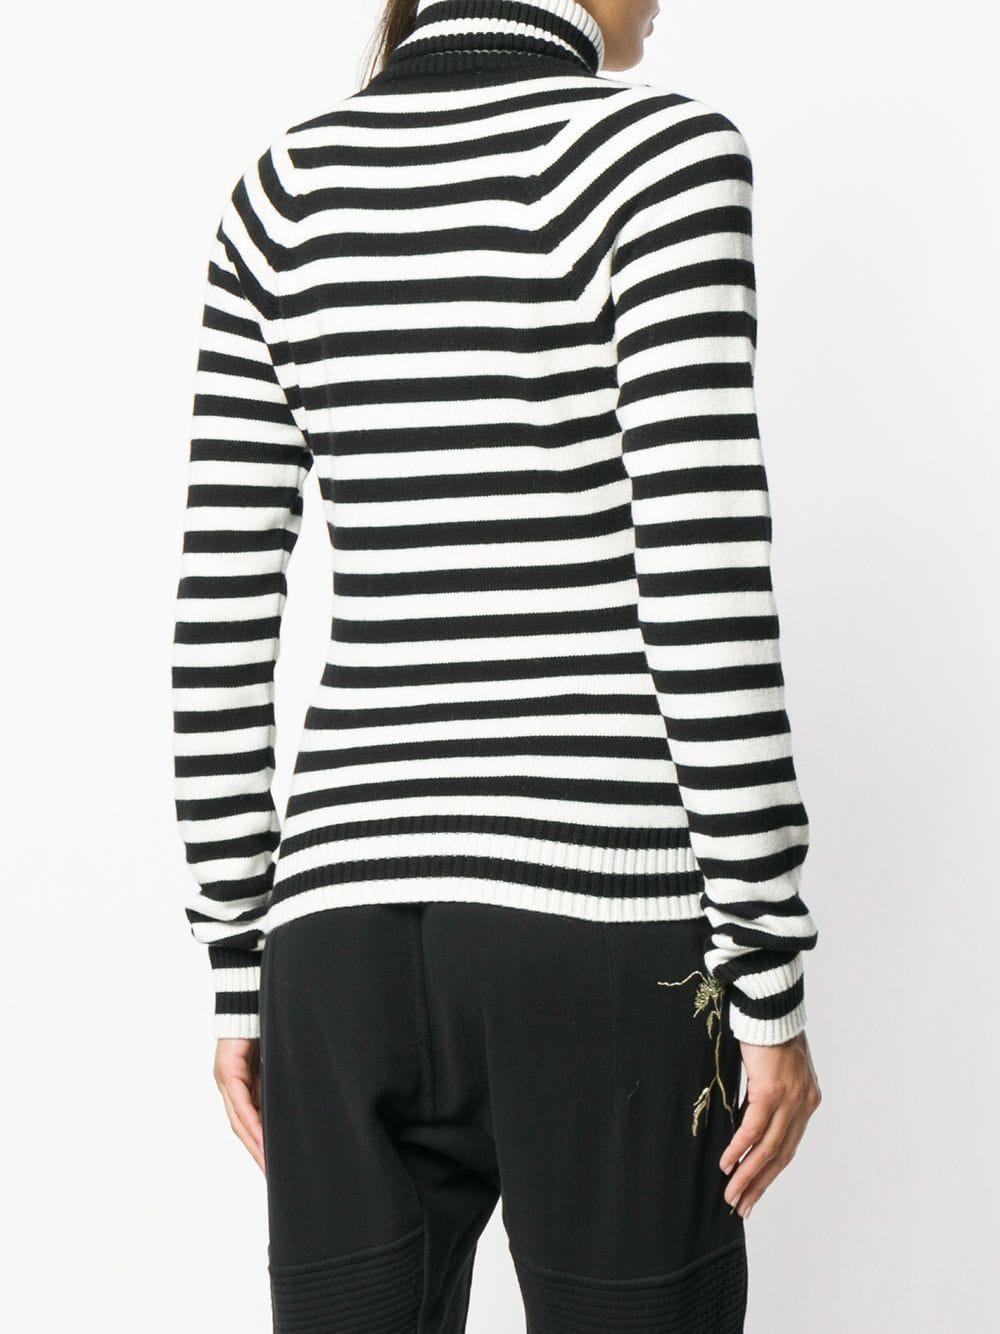 65548f6925 Haider Ackermann - White Striped Knit Sweater - Lyst. View fullscreen